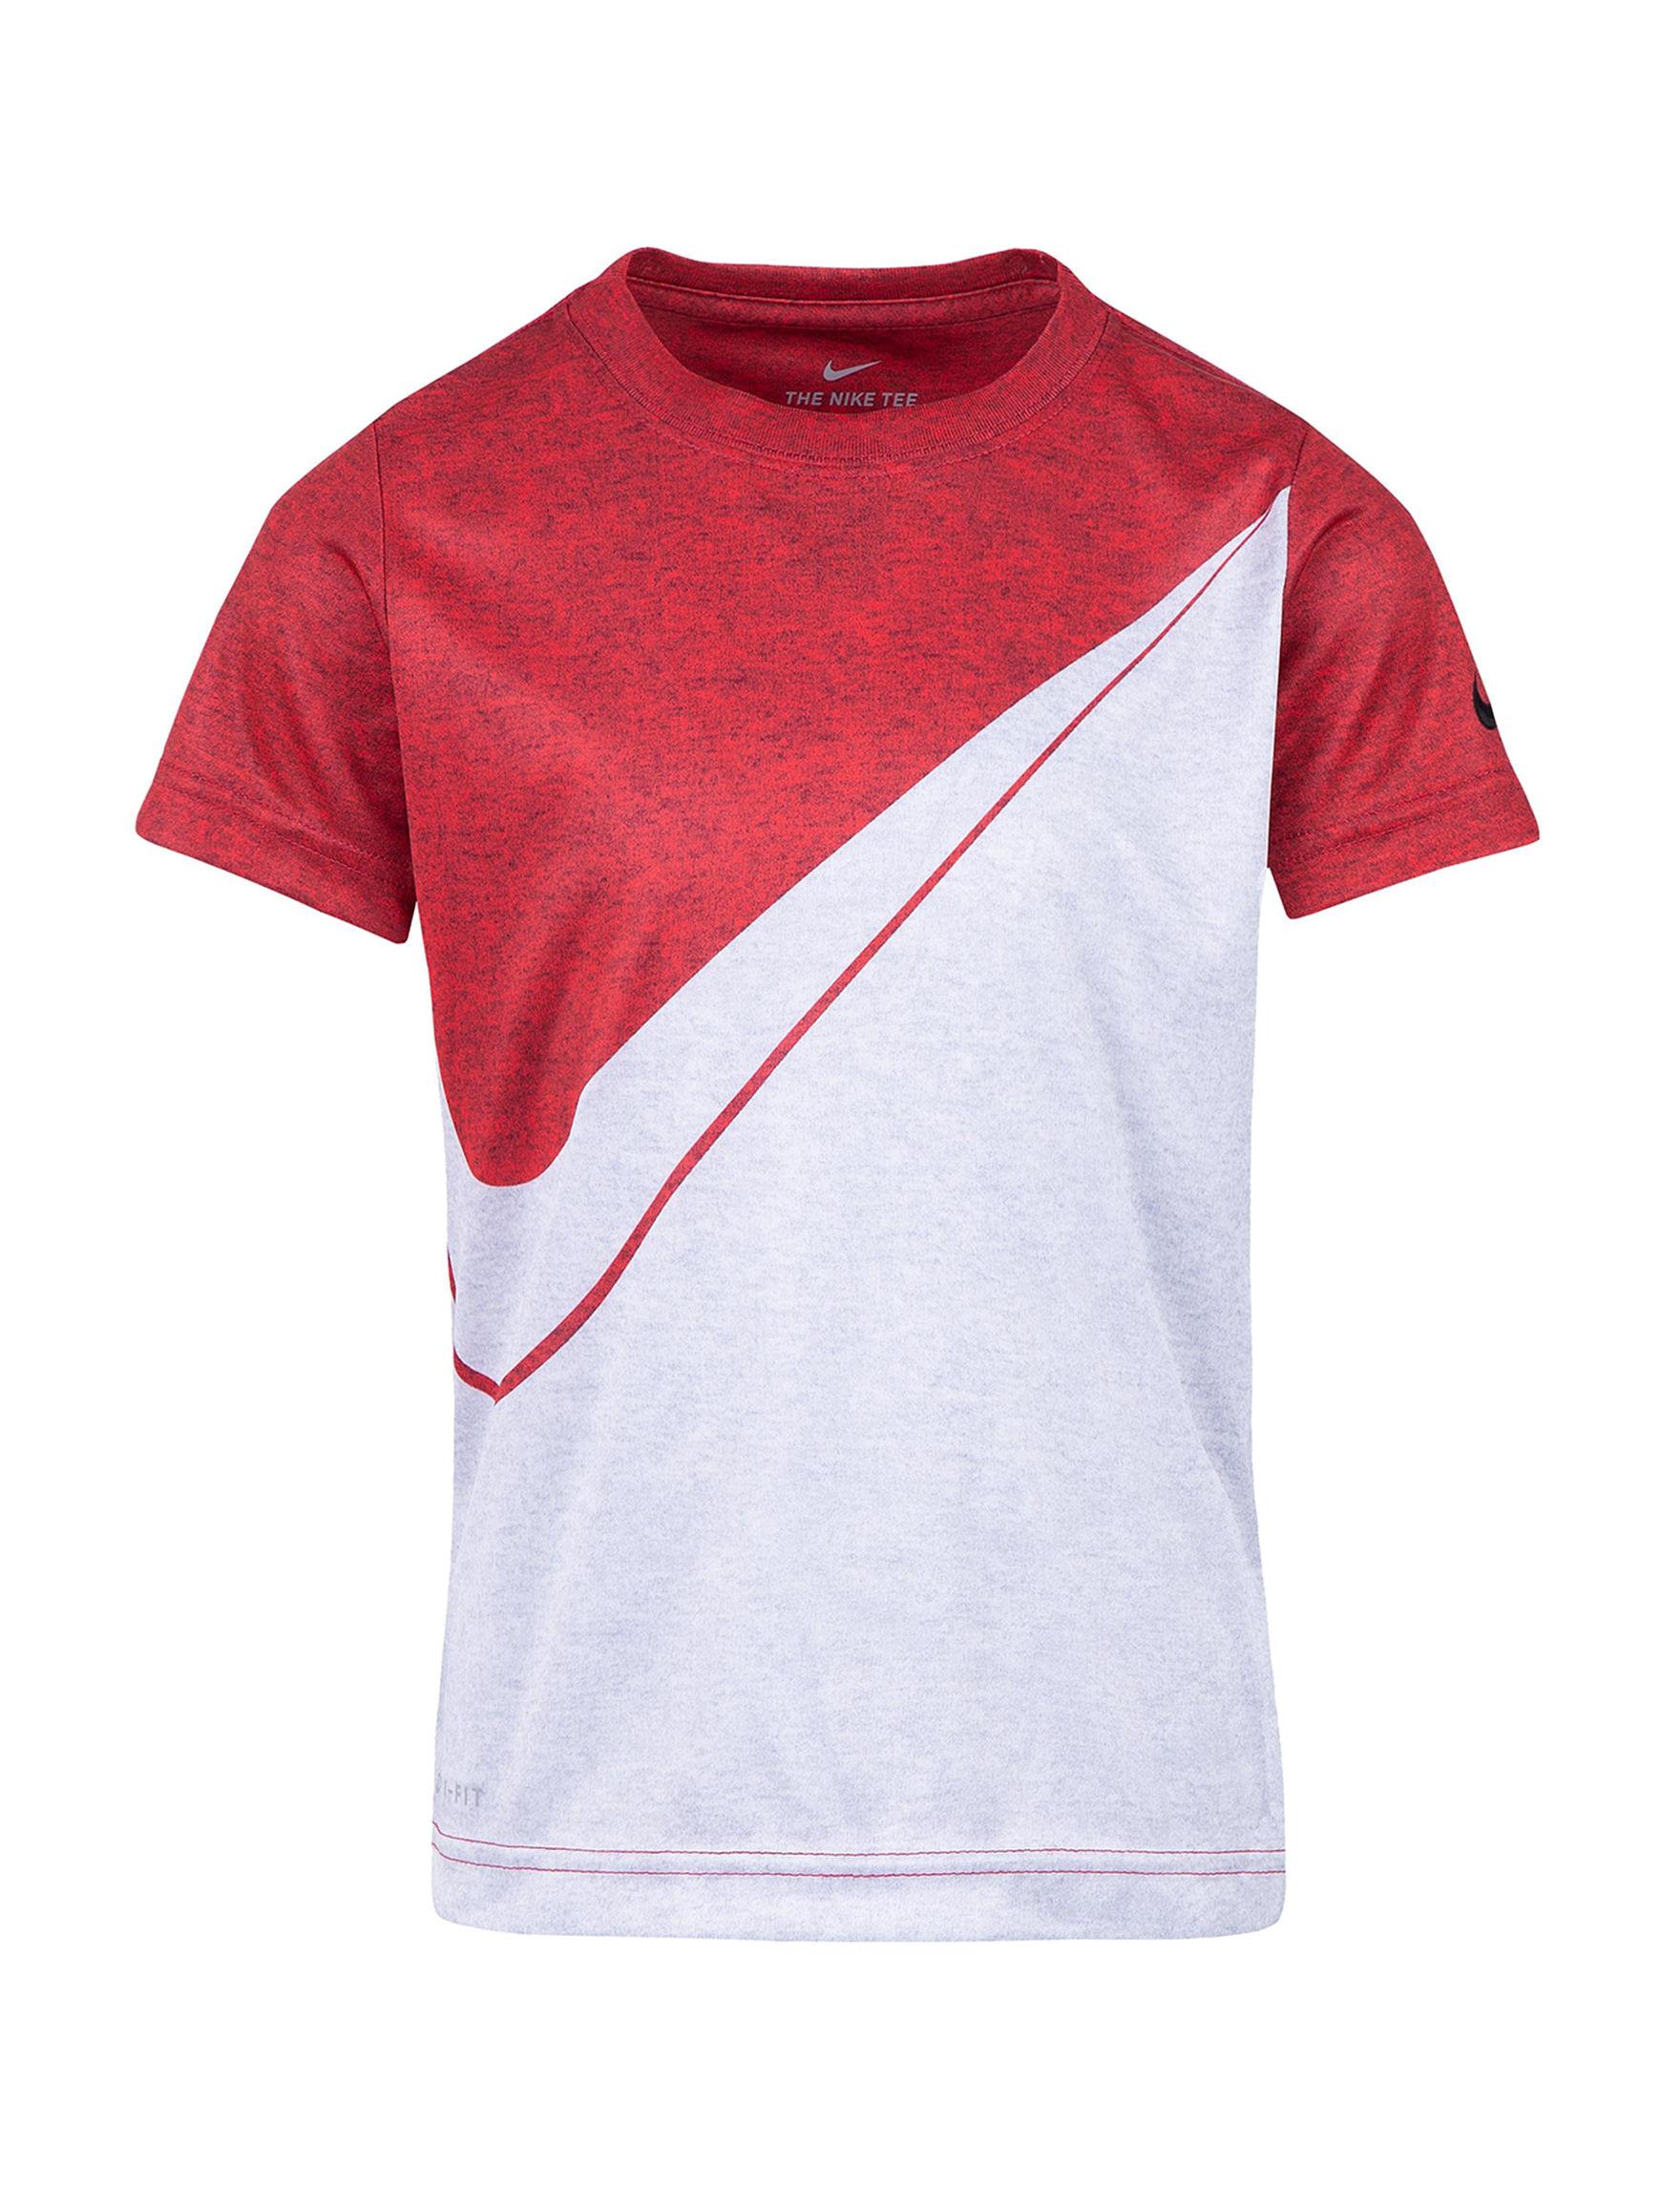 Nike Red / White Tees & Tanks